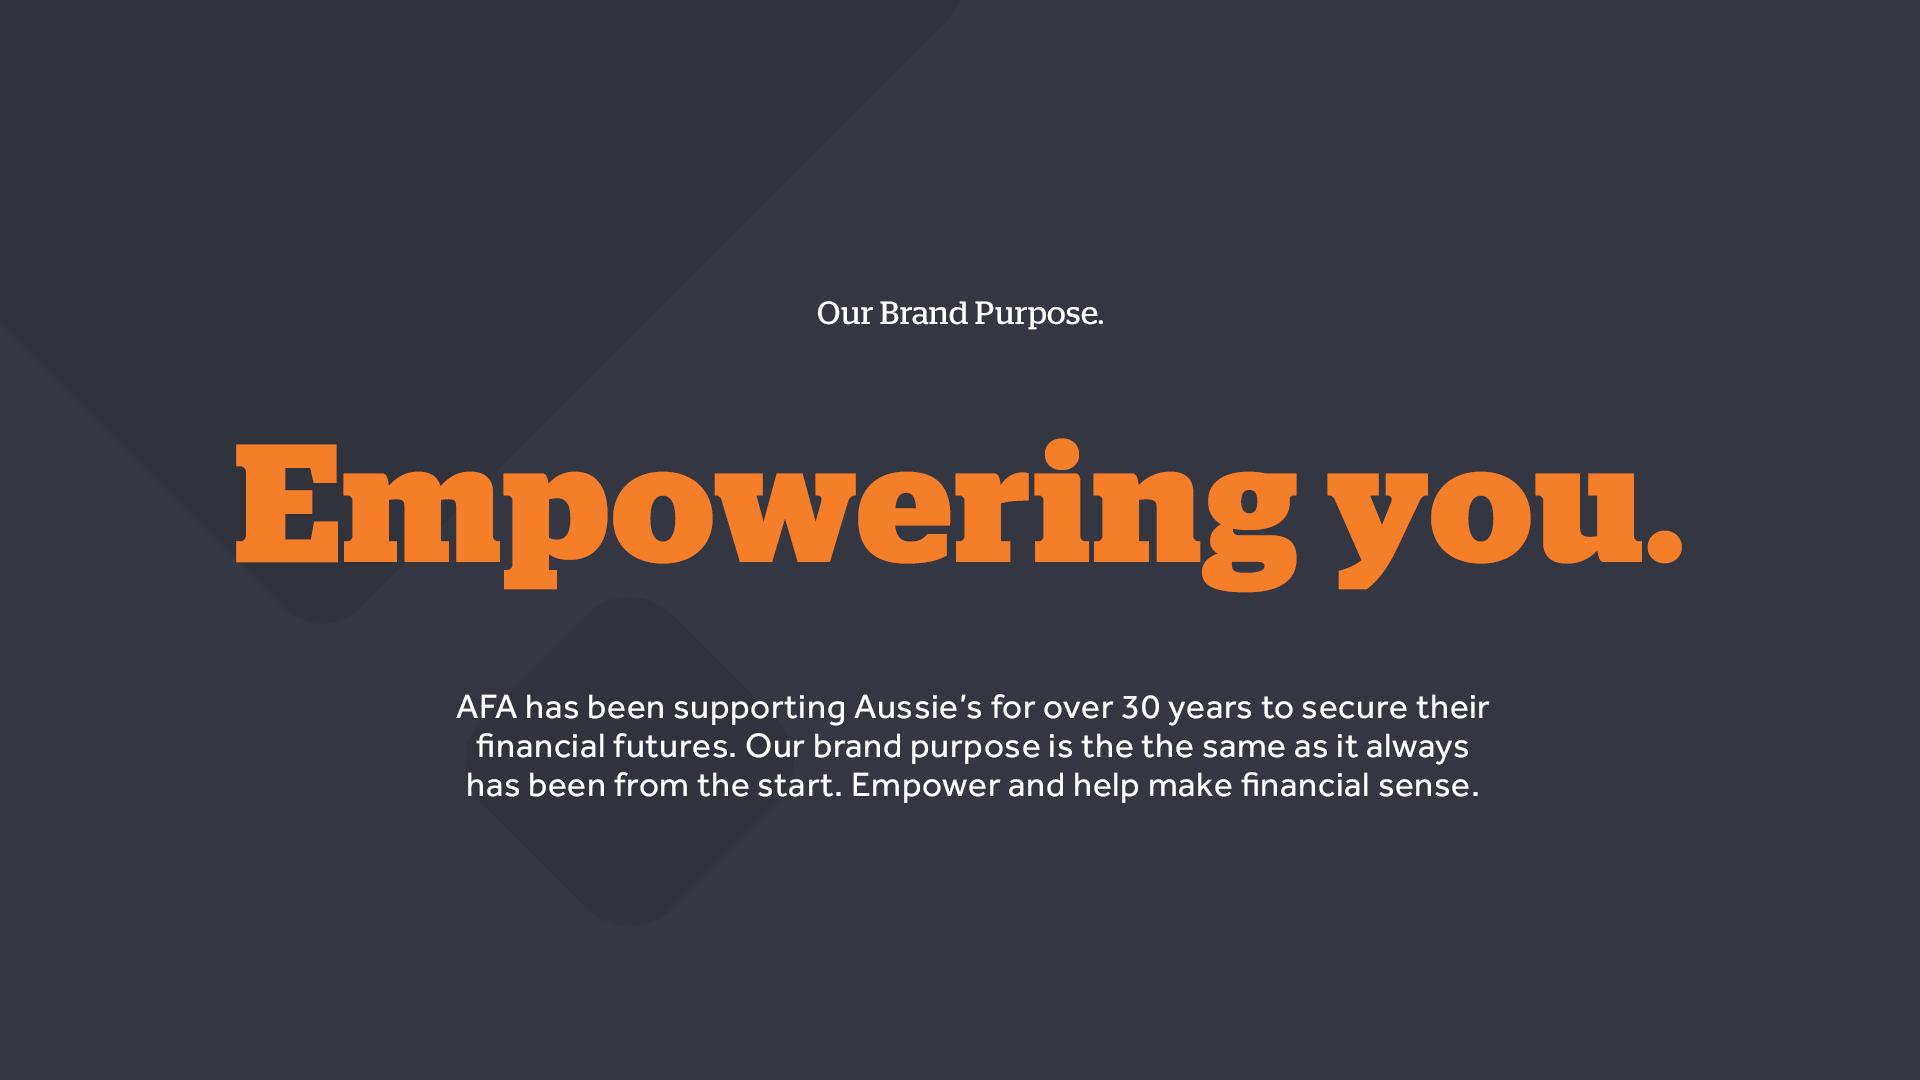 AFA_Brand_identityArtboard 1 copy 3.jpg